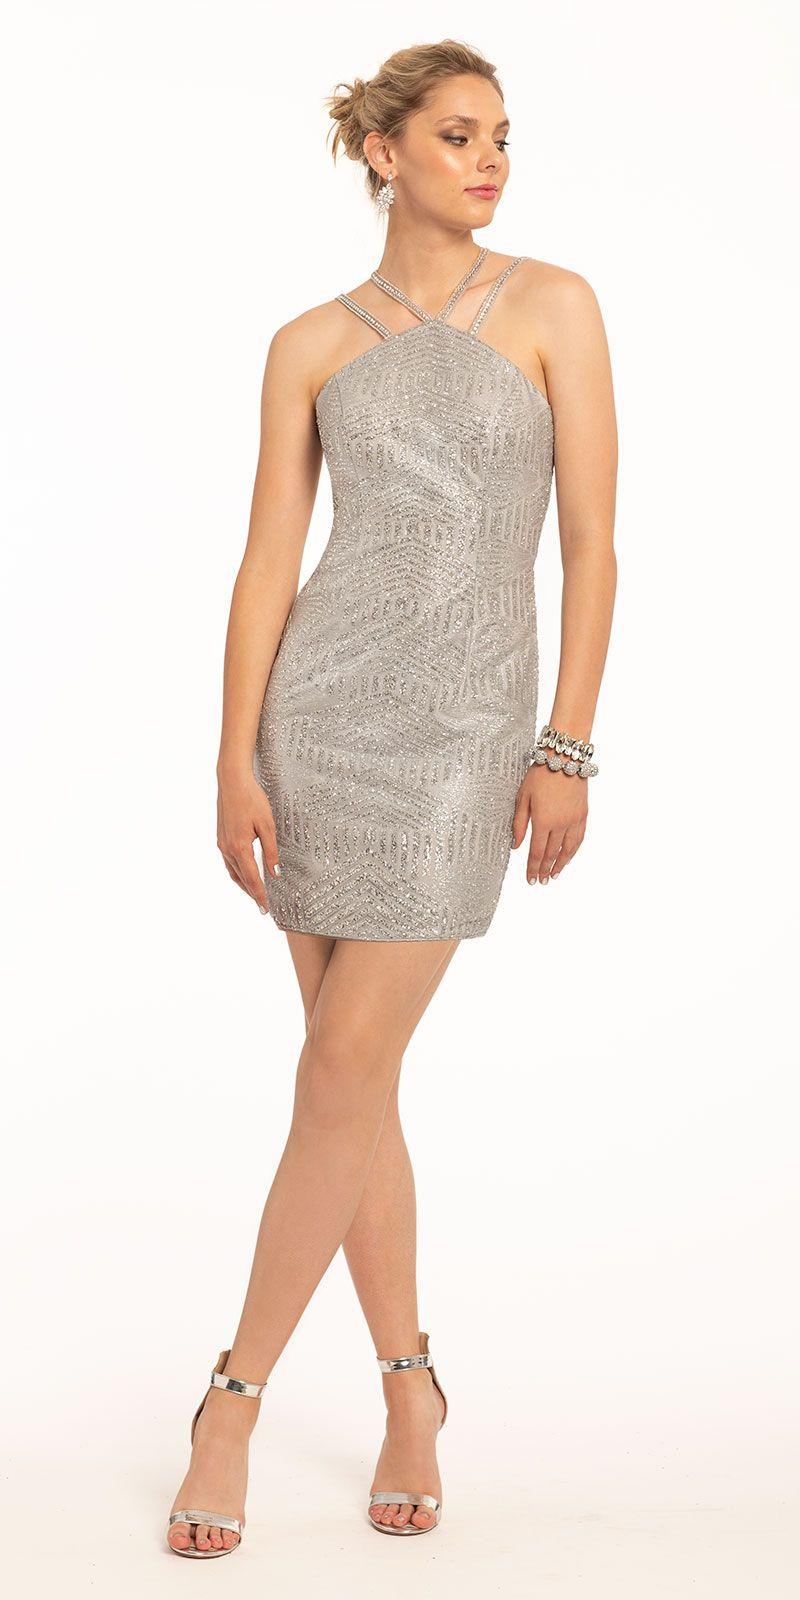 Short Rhinestone Strap Glitter Mesh Dress Short Cocktail Dress Cocktail Dress Cocktail Dress Lace [ 1600 x 800 Pixel ]